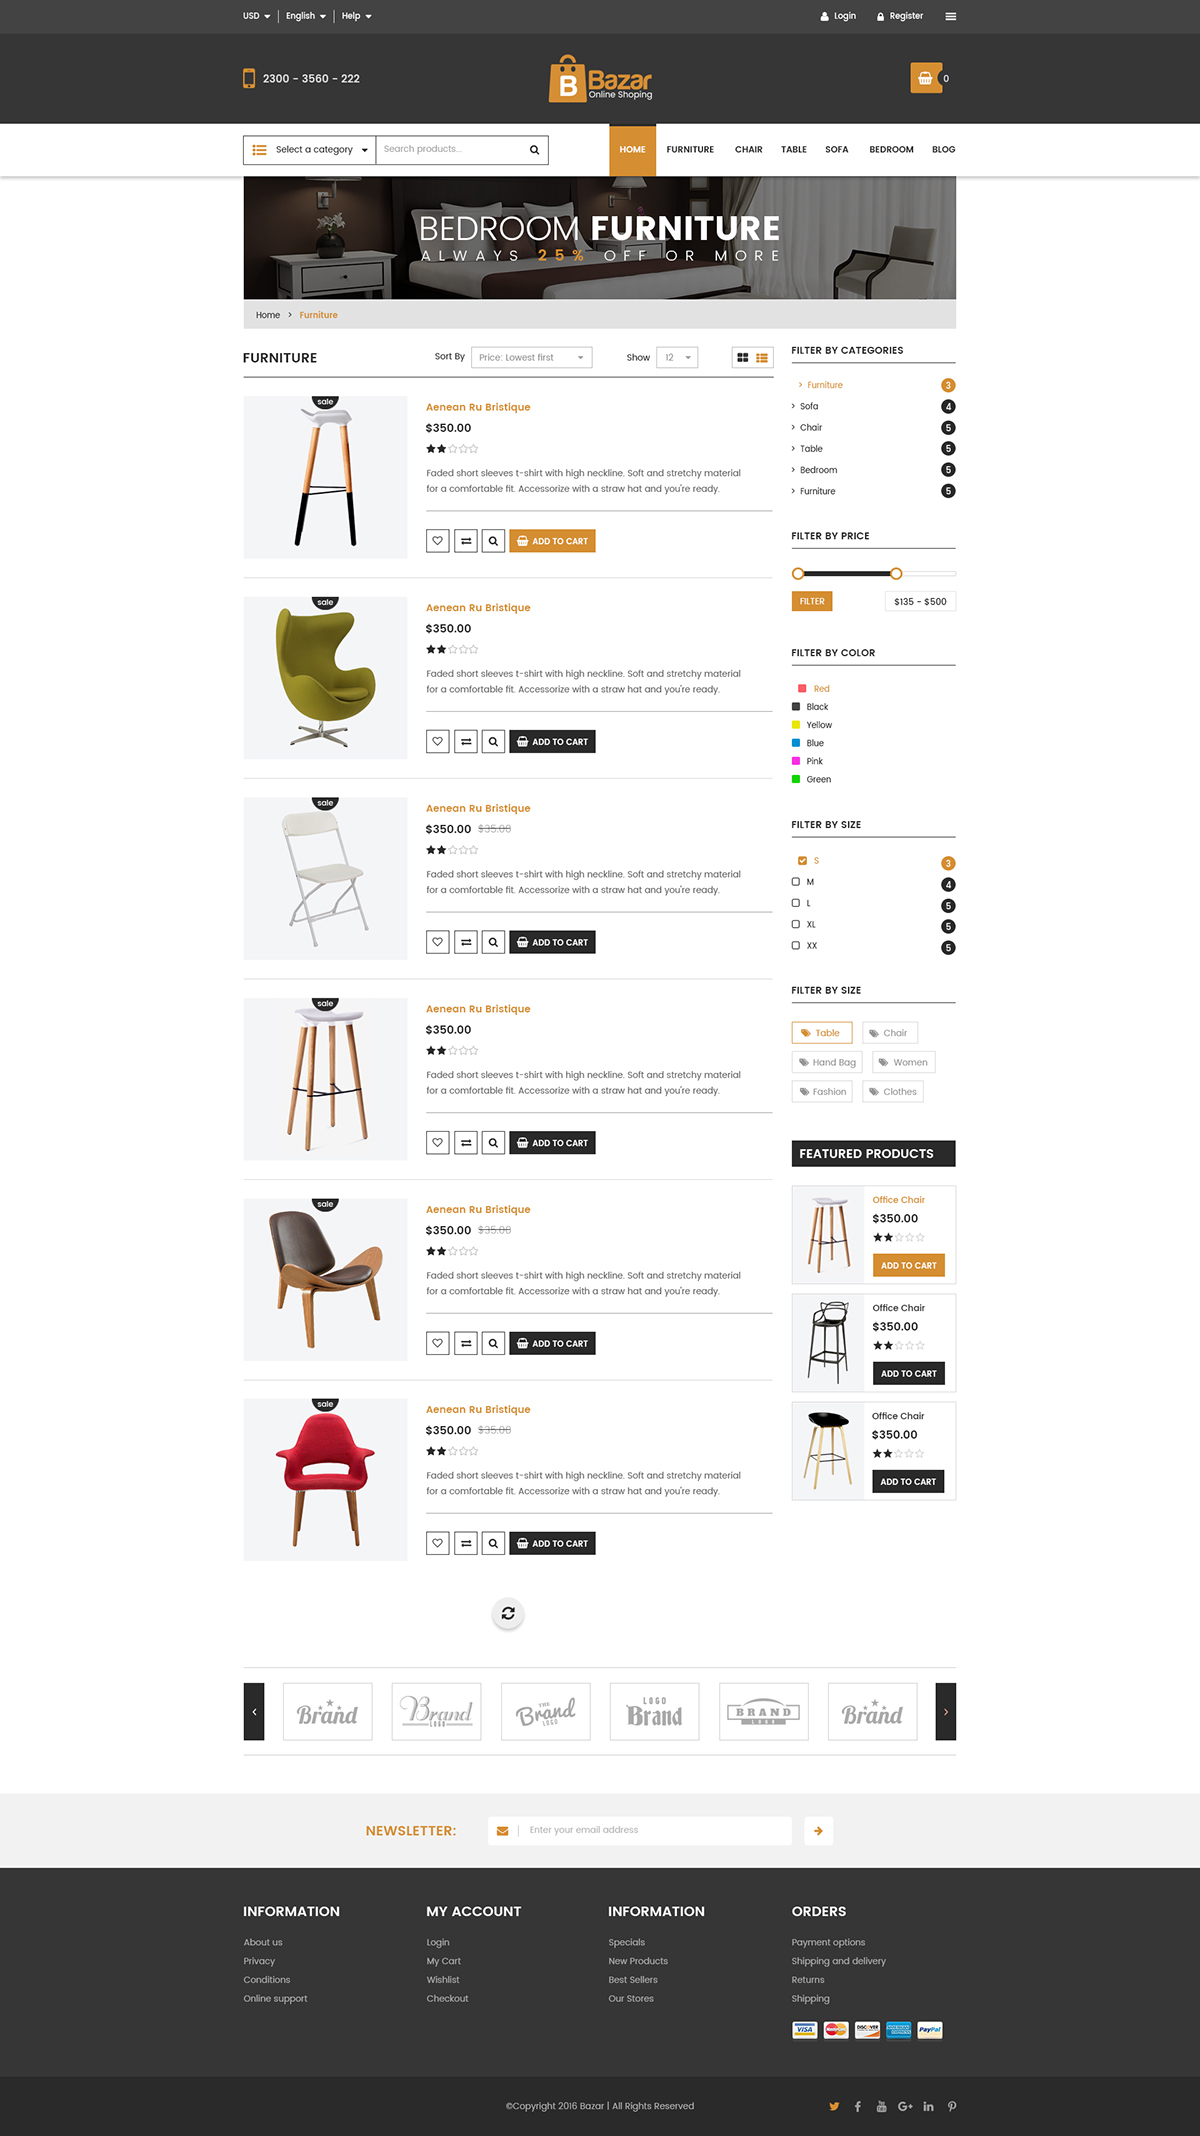 Ecommerce free psd free web template free ecommerce psd UI ux psd template free shopping template online shop template bazar psd template